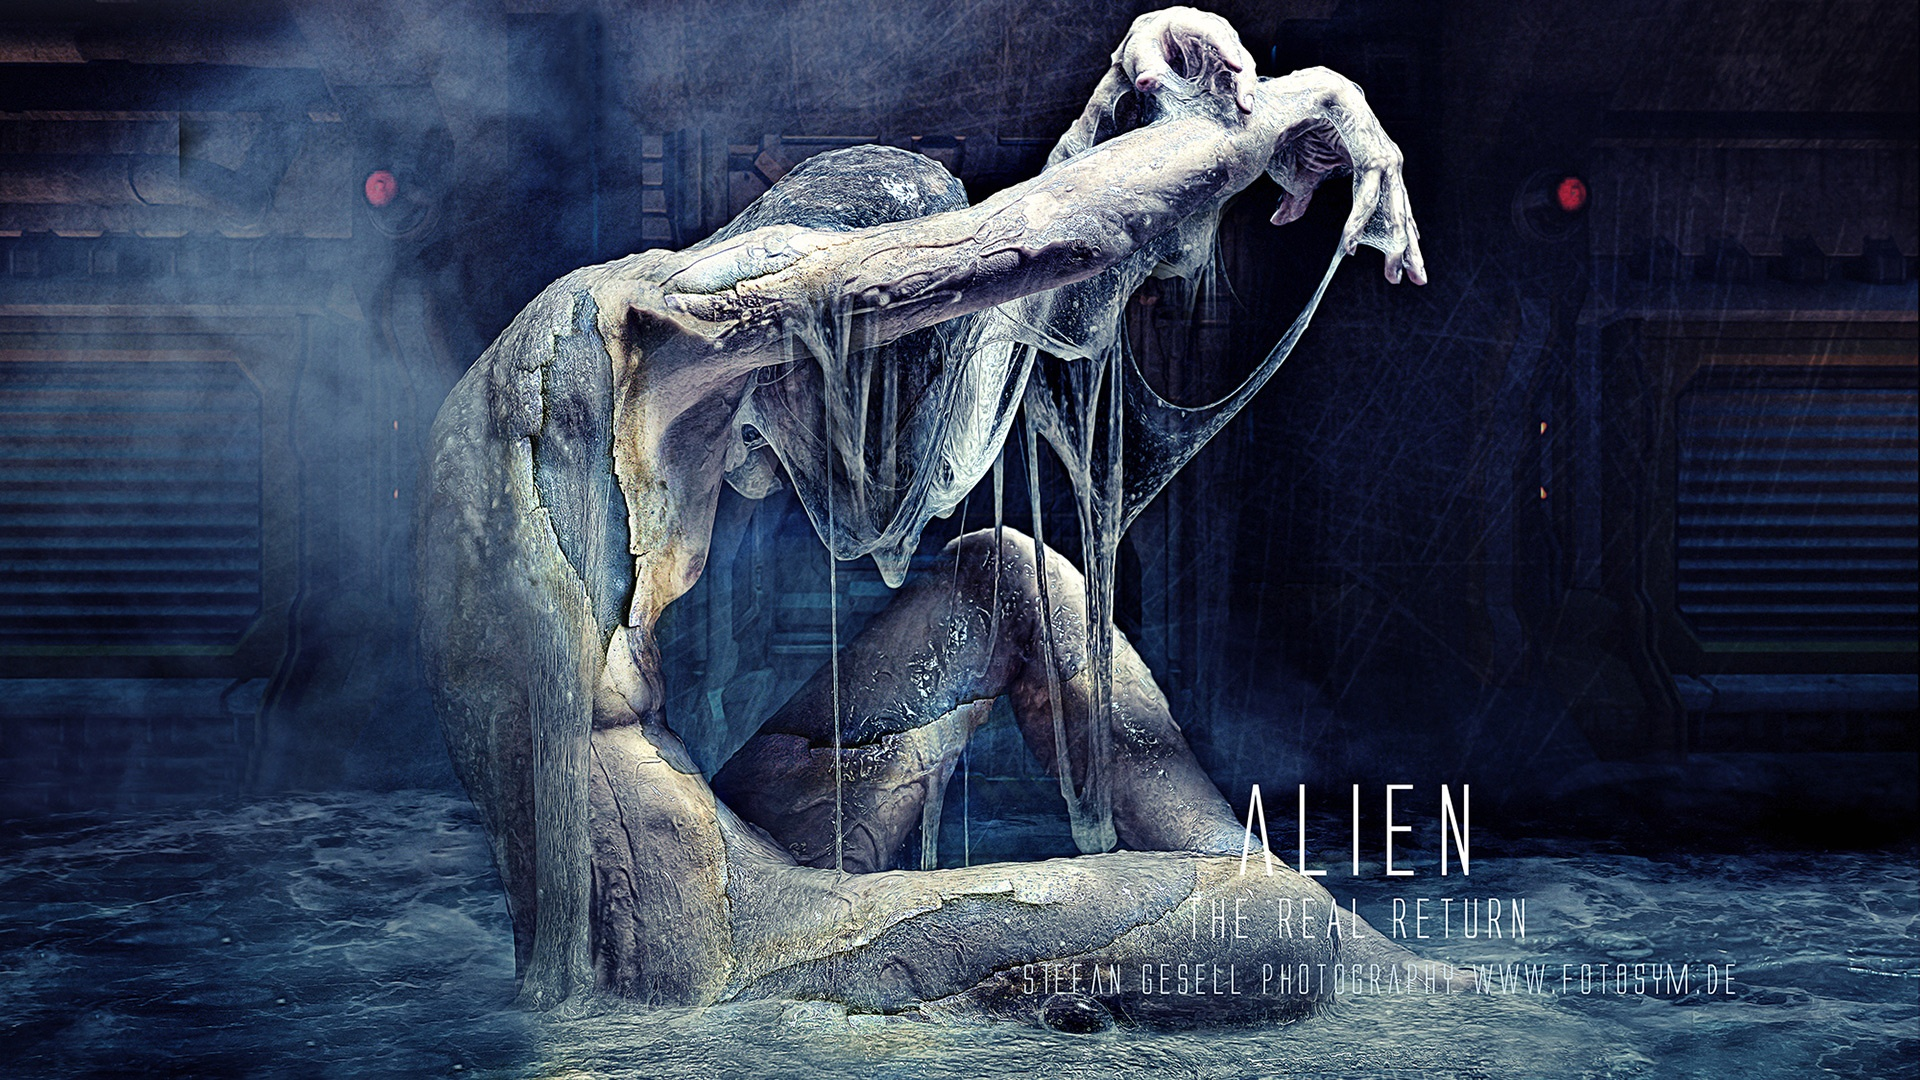 Alien naked wallpaper sex images